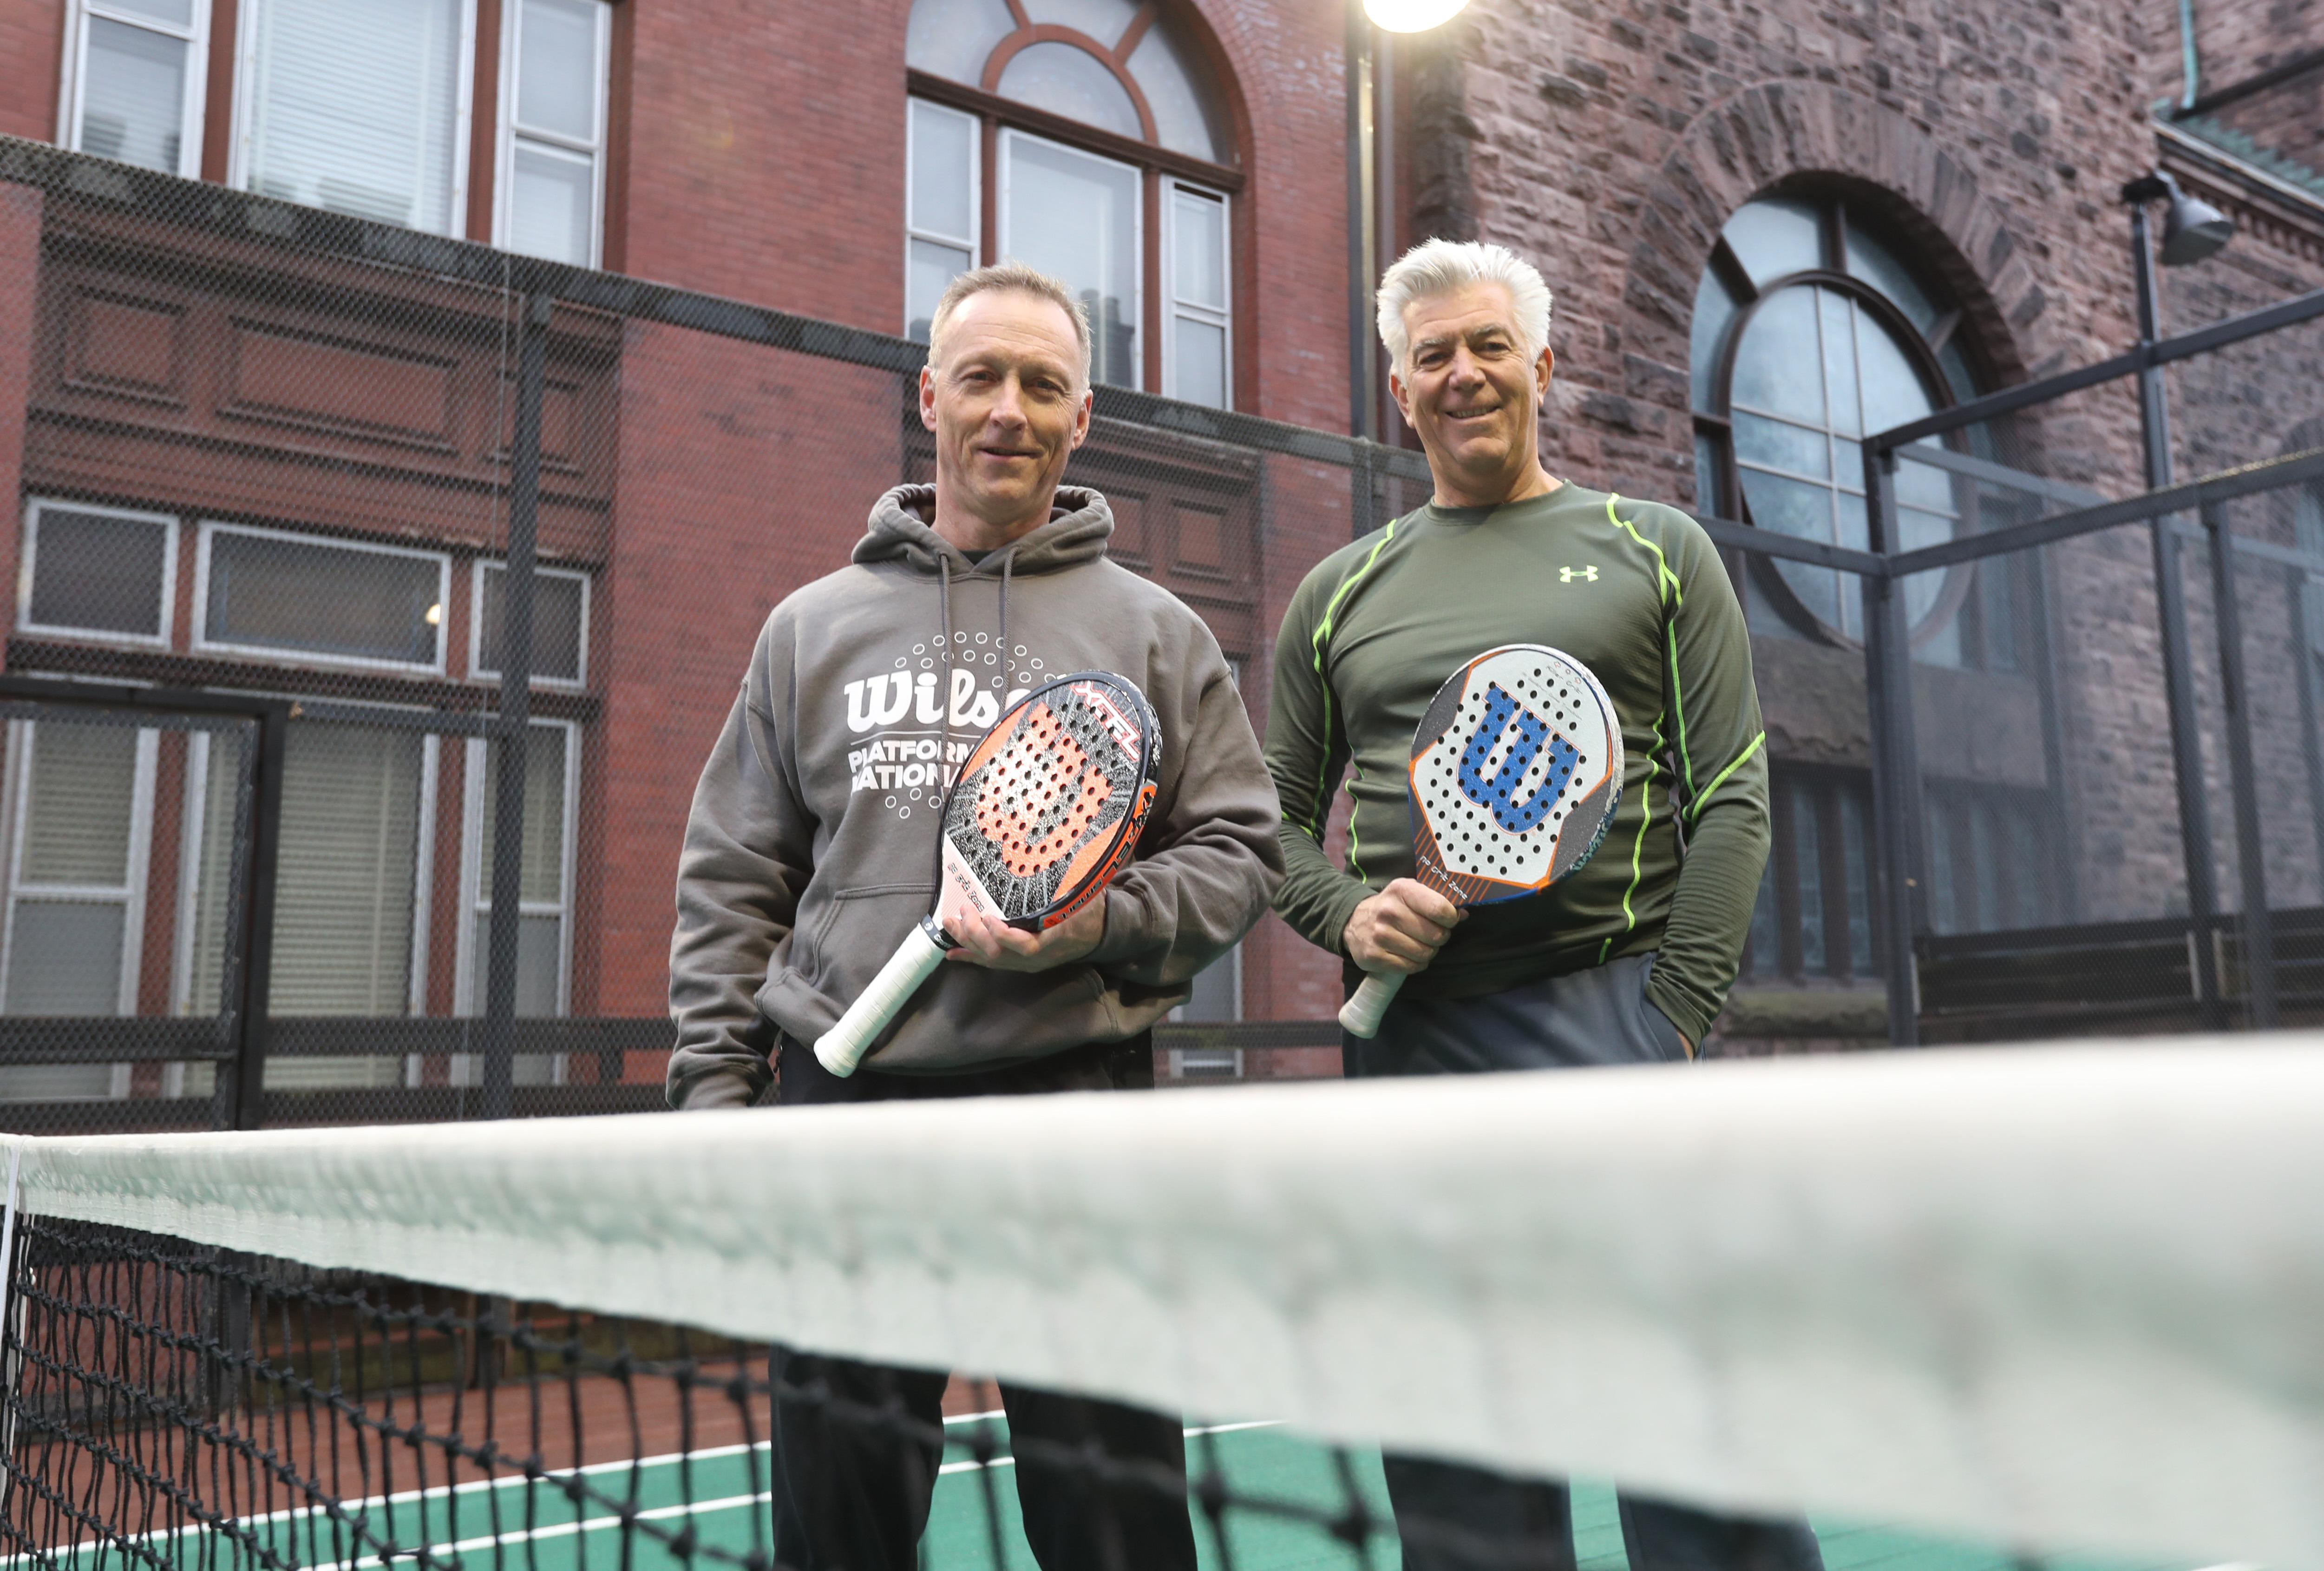 Platform tennis players Paul Herlan, left, and Chris Ross at Buffalo's Saturn Club. (James P. McCoy/Buffalo News)